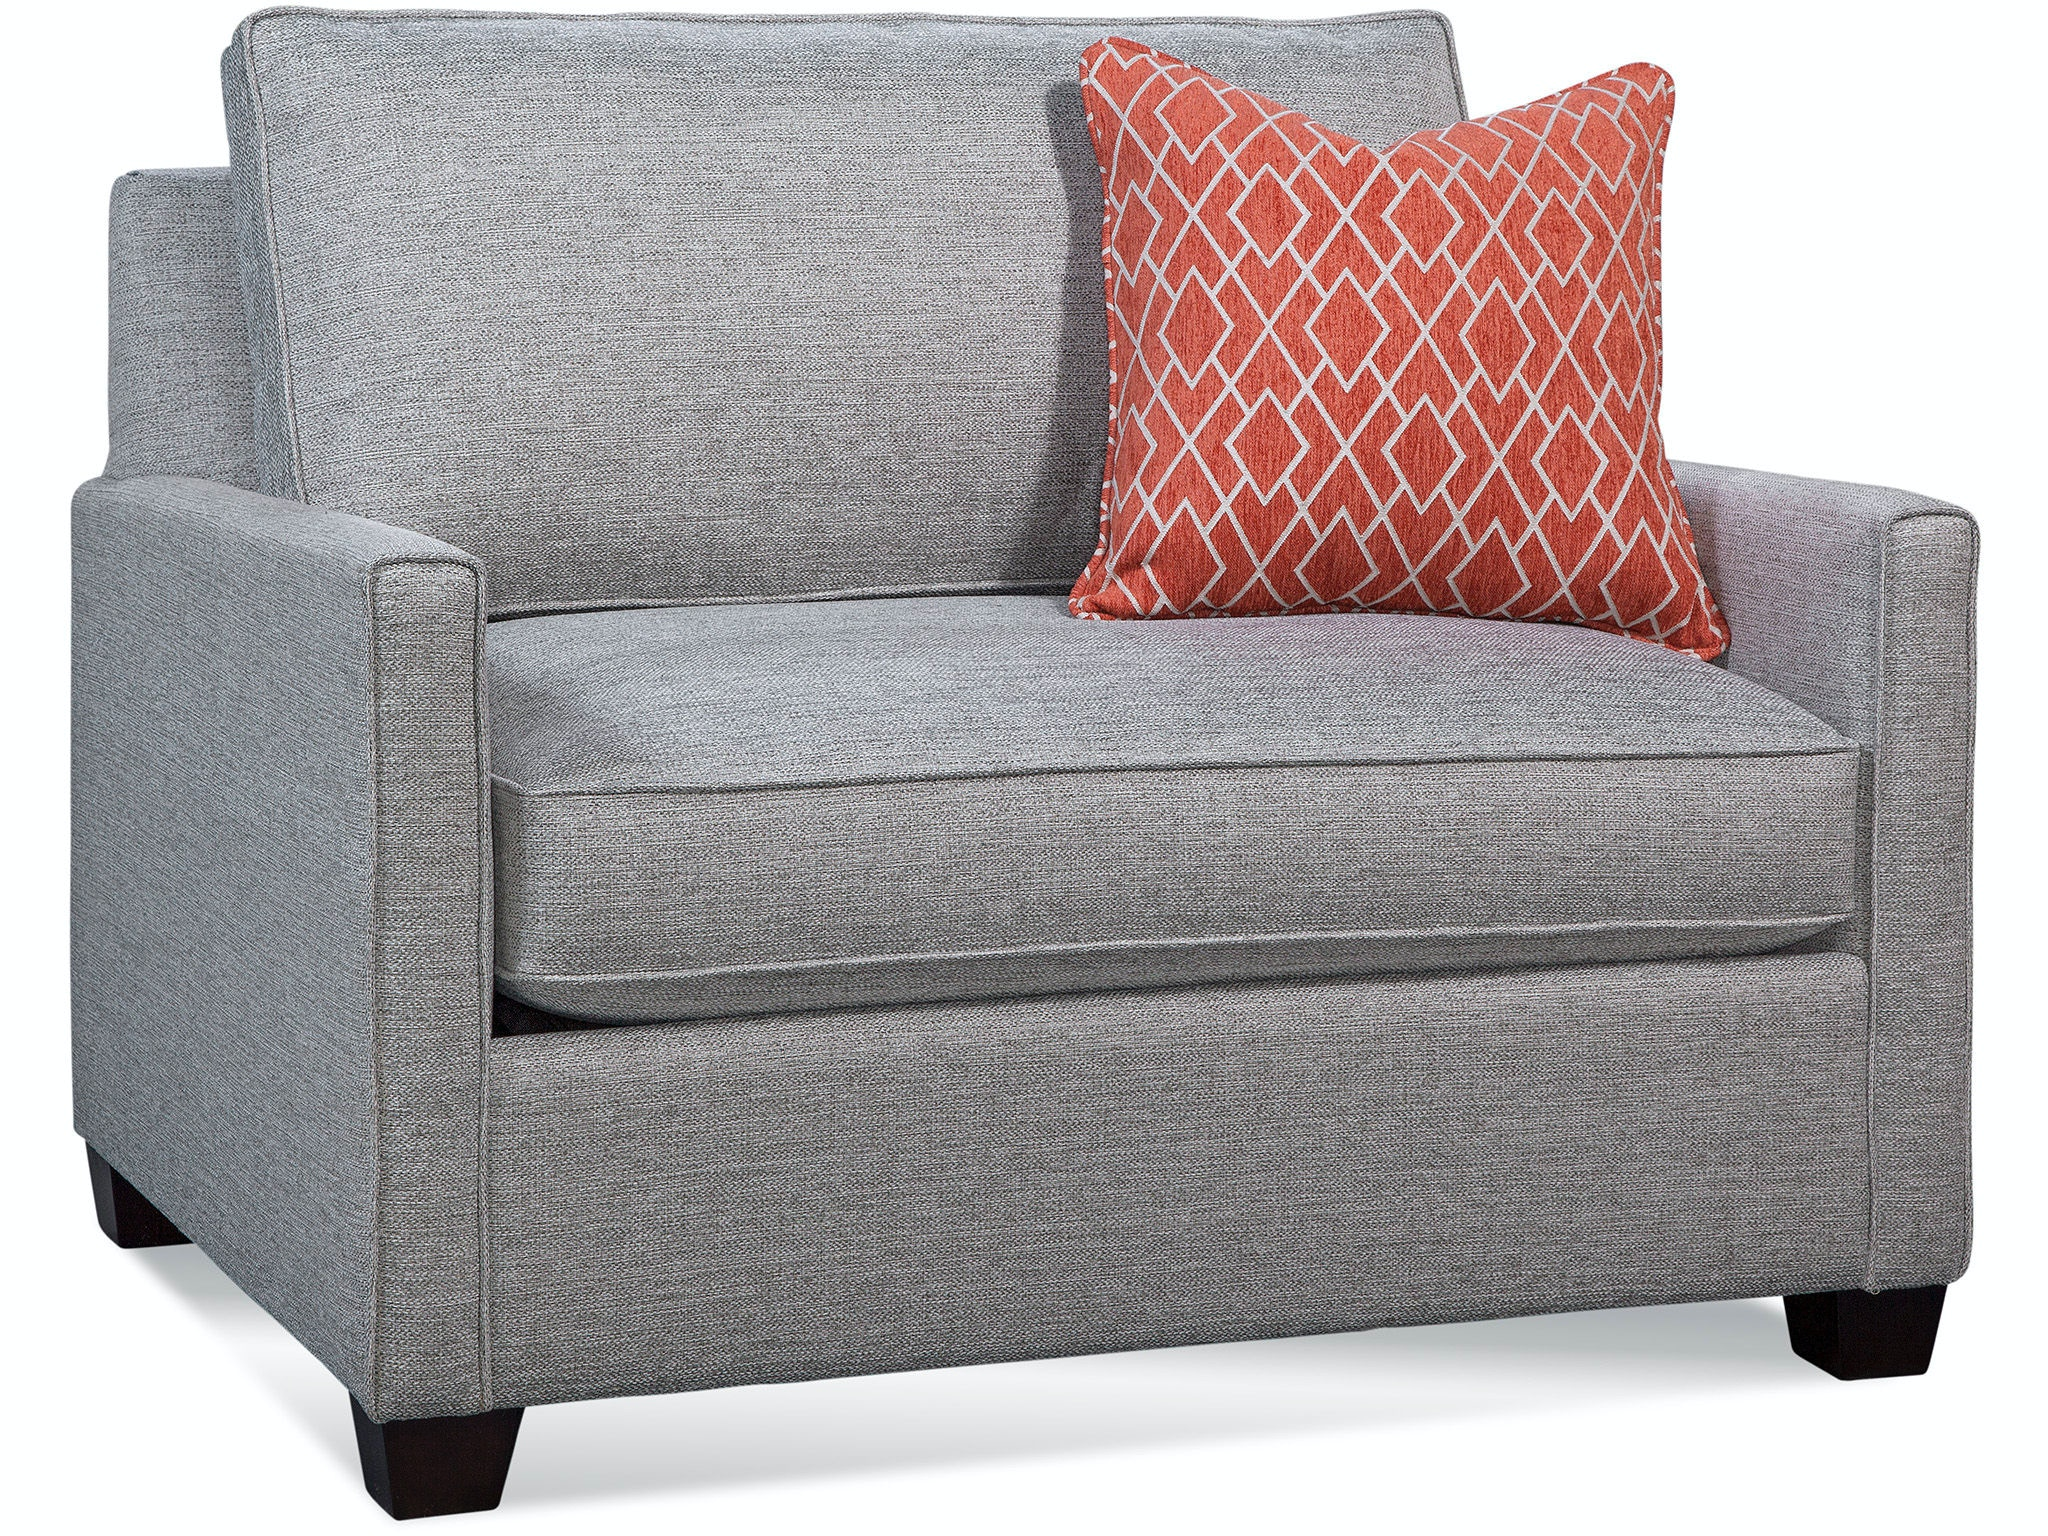 Braxton Culler Twin Sleeper Chair 724 014